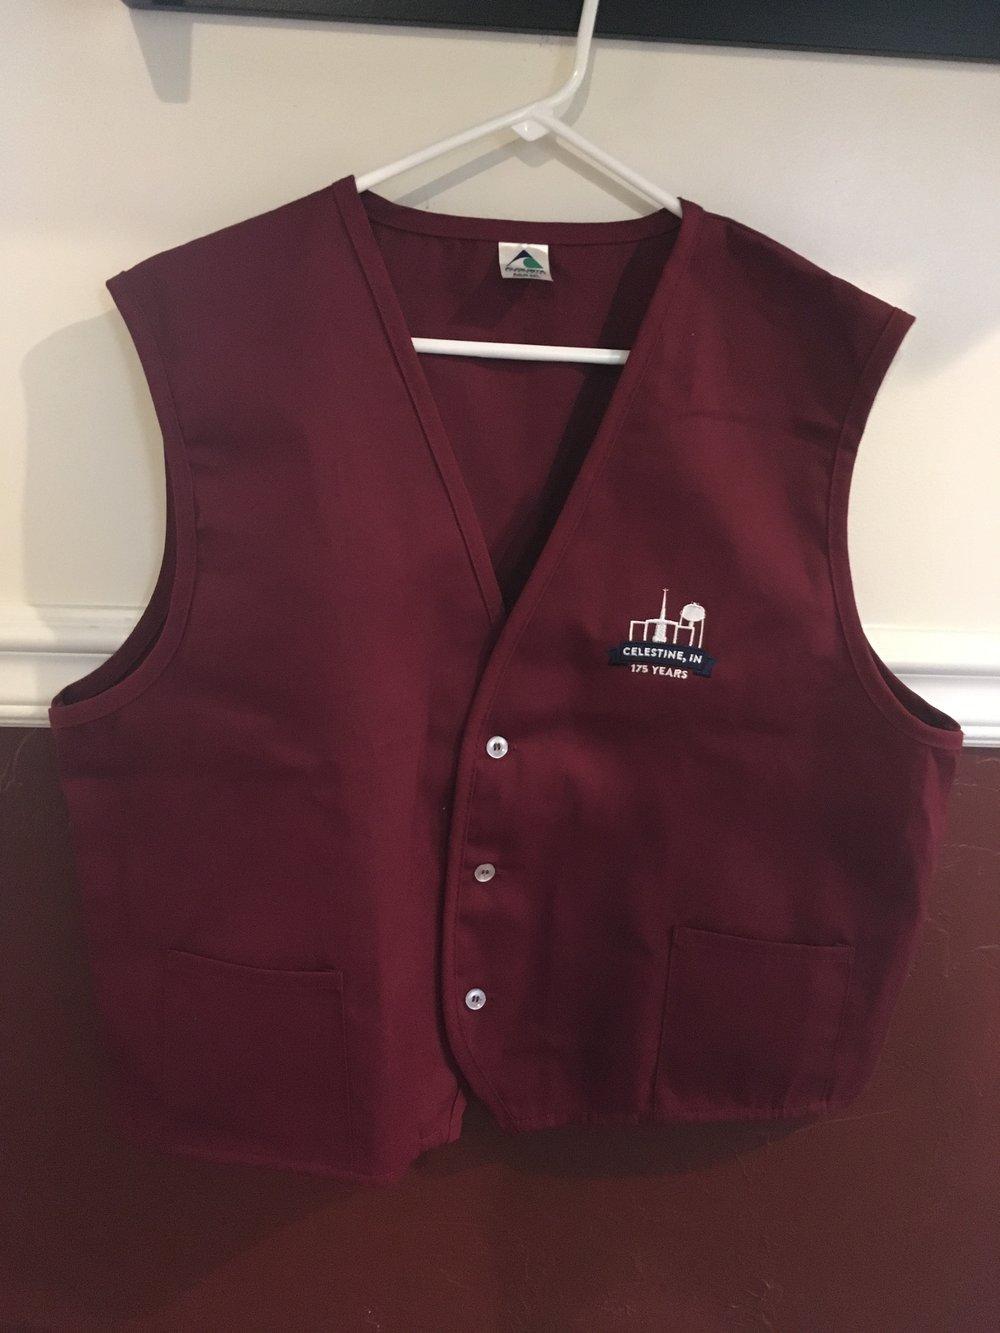 Vest (M, XL, XXL only) - $20